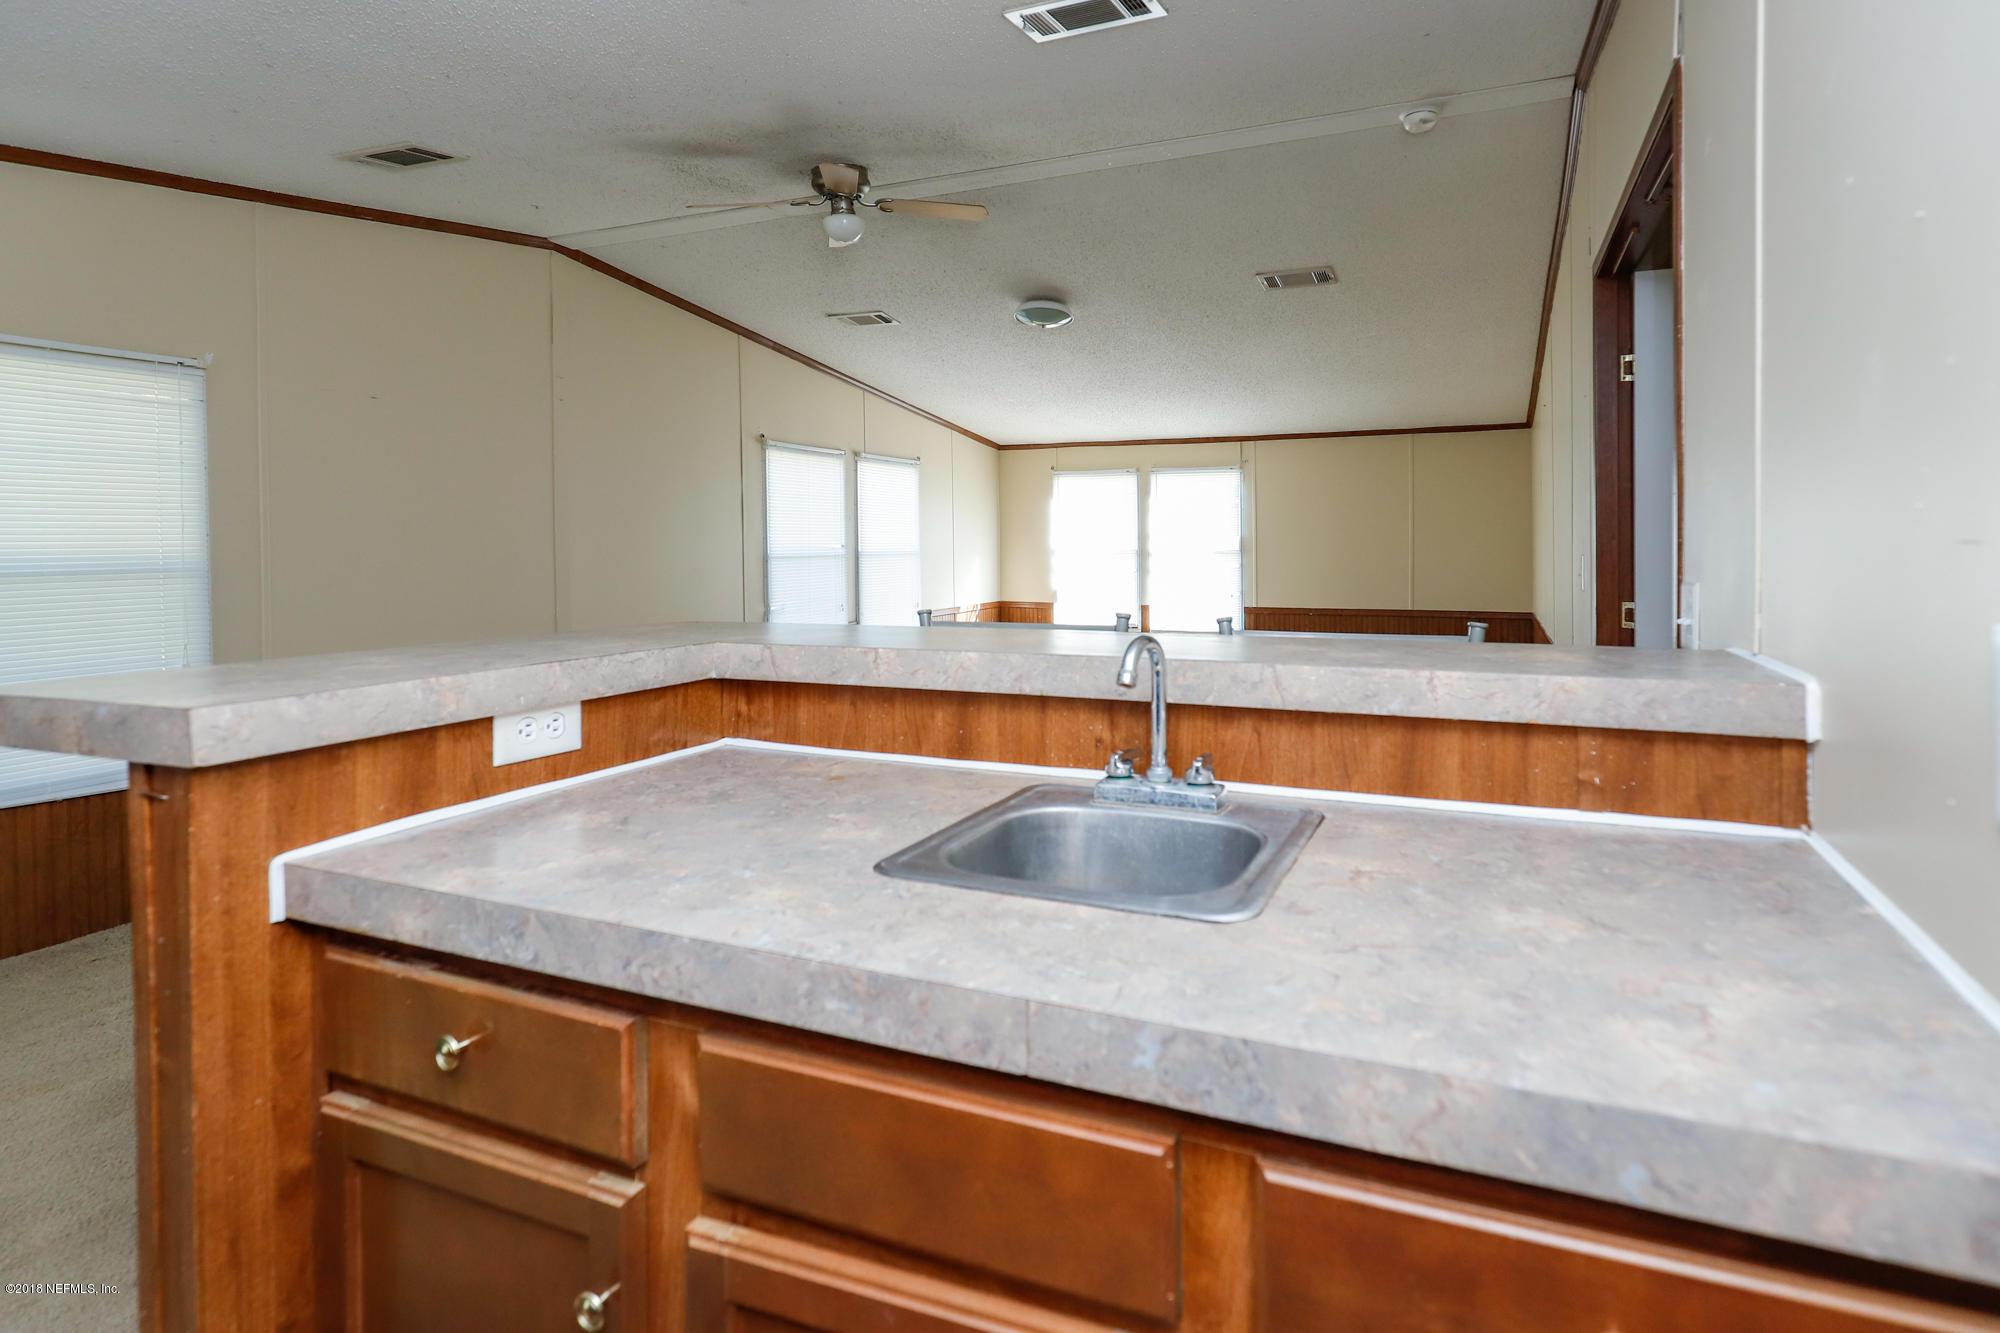 16055 SHELLCRACKER, JACKSONVILLE, FLORIDA 32226, 4 Bedrooms Bedrooms, ,2 BathroomsBathrooms,Residential - mobile home,For sale,SHELLCRACKER,951887